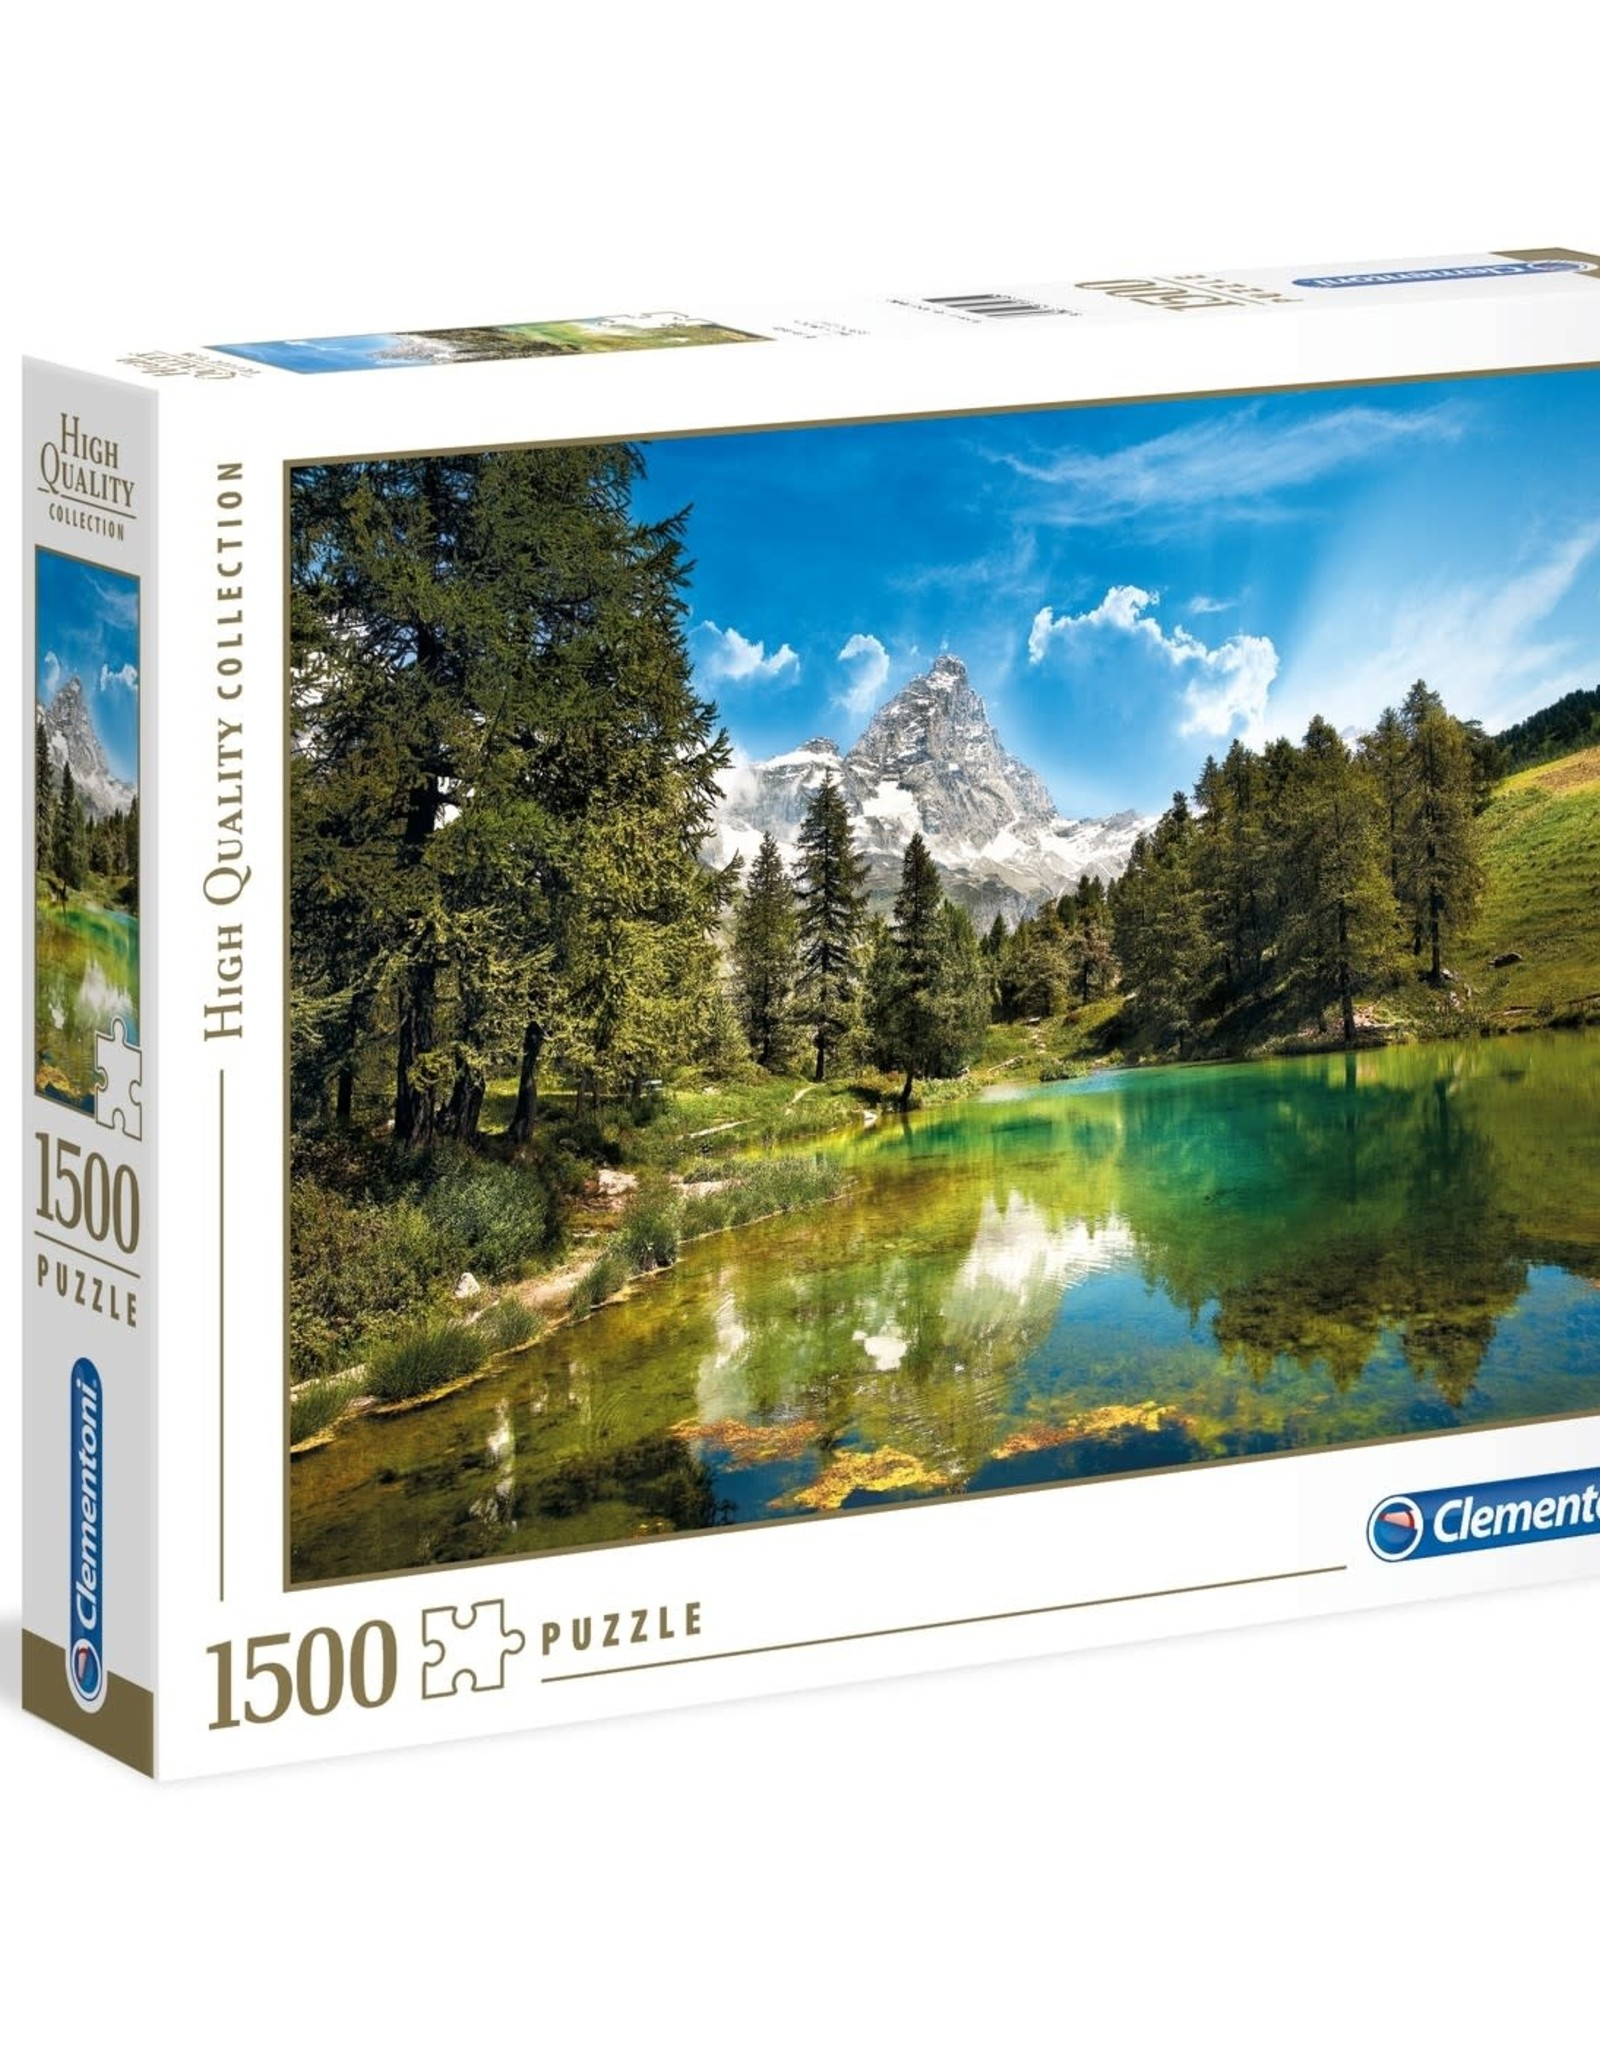 Clementoni 1500PC HQC -  BLUE LAKE